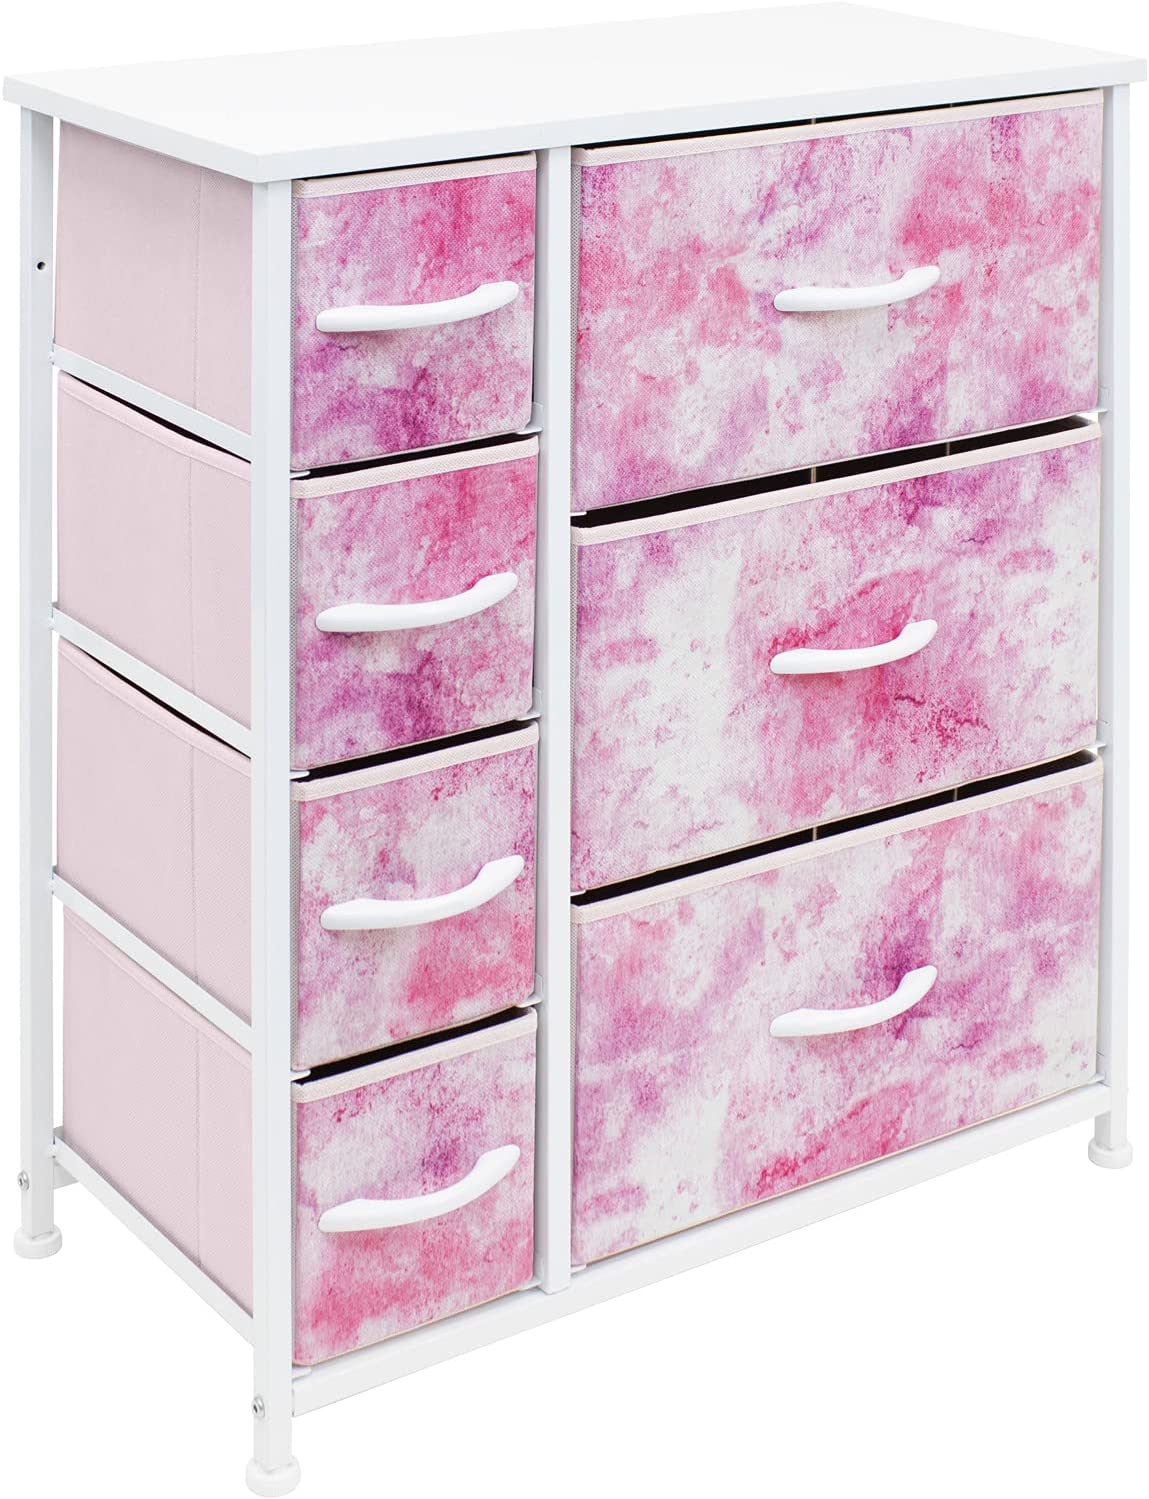 Sorbus Dresser Organizer,for Kids - Boys & Girls Bedroom Organization, Baby Dresser - Clothing Organizer, Storage Drawers for Toys - Steel Frame, Wood Top, Fabric, (7-Drawer, Pastel Tie-dye Pink)